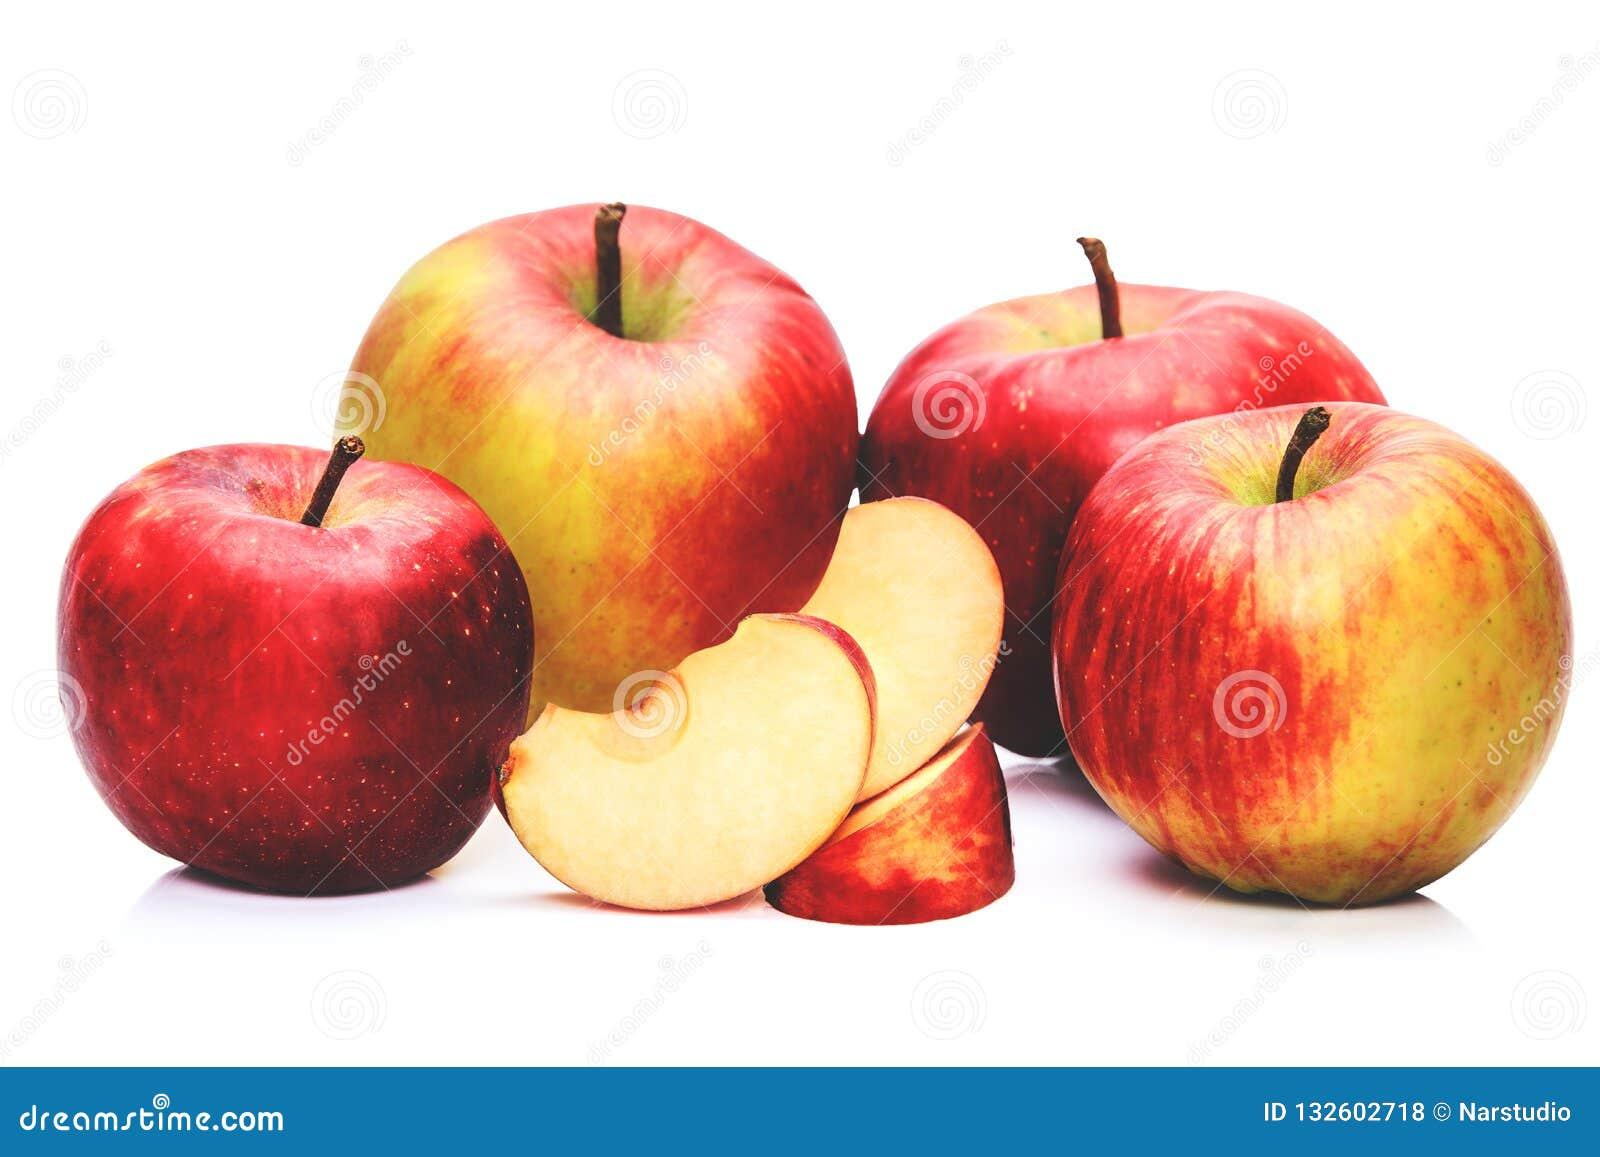 Domestic Apples Stock Photo Image Of Freshness Fiber 132602718